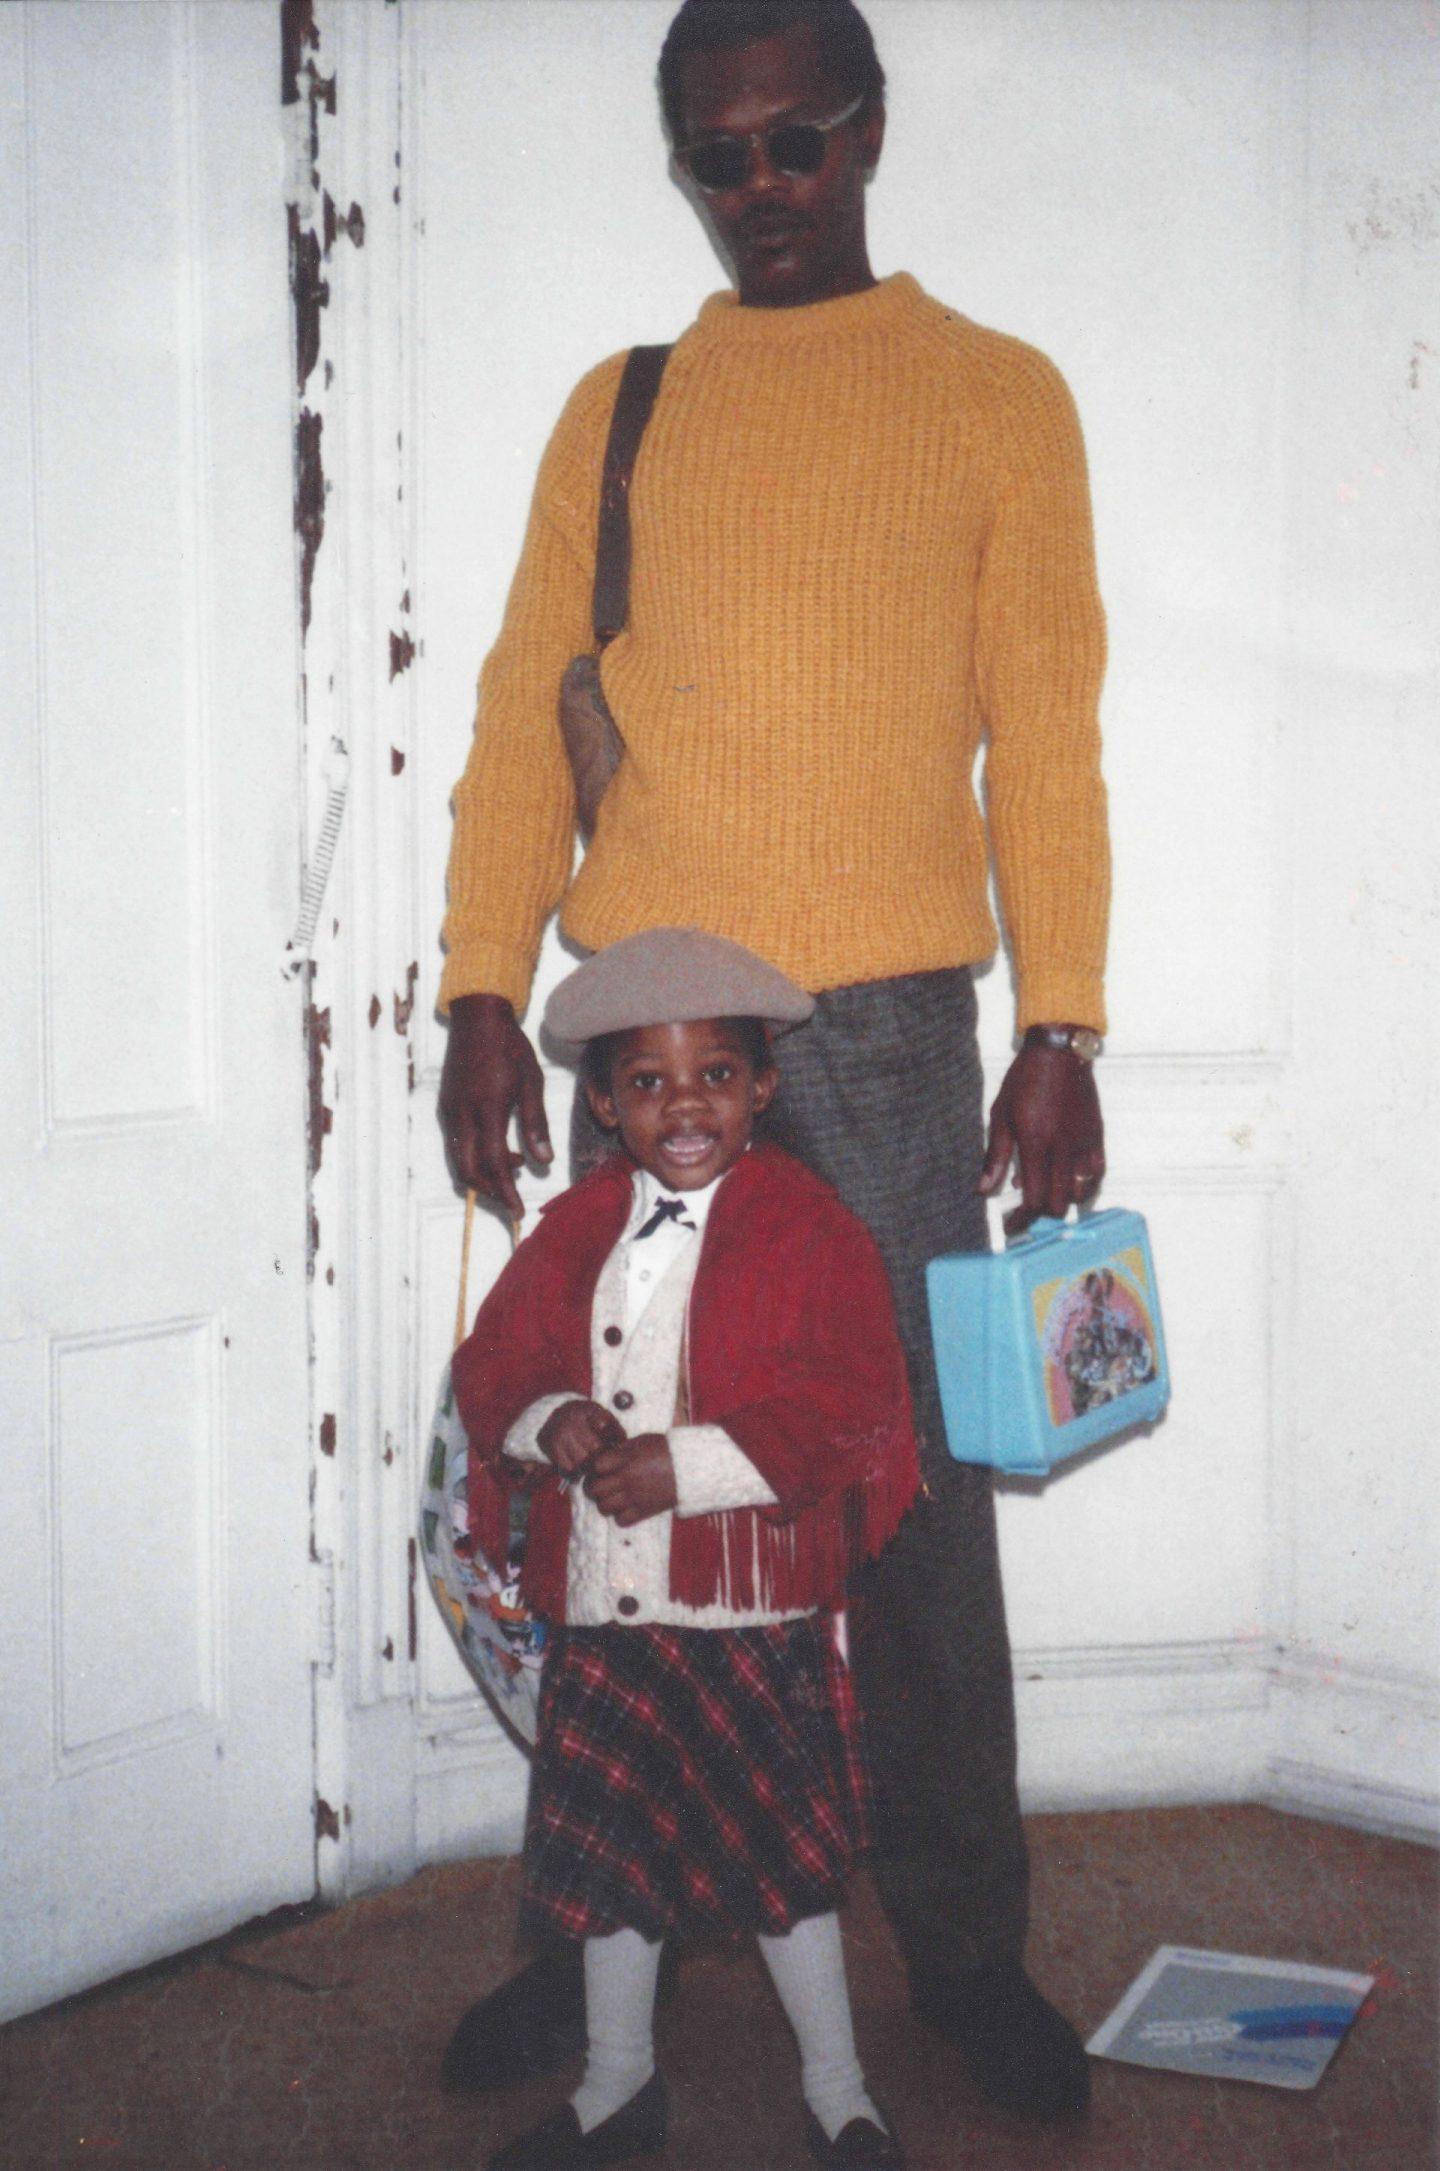 Samuel L. Jackson, Zoe Jackson, To Me He Was Just dad